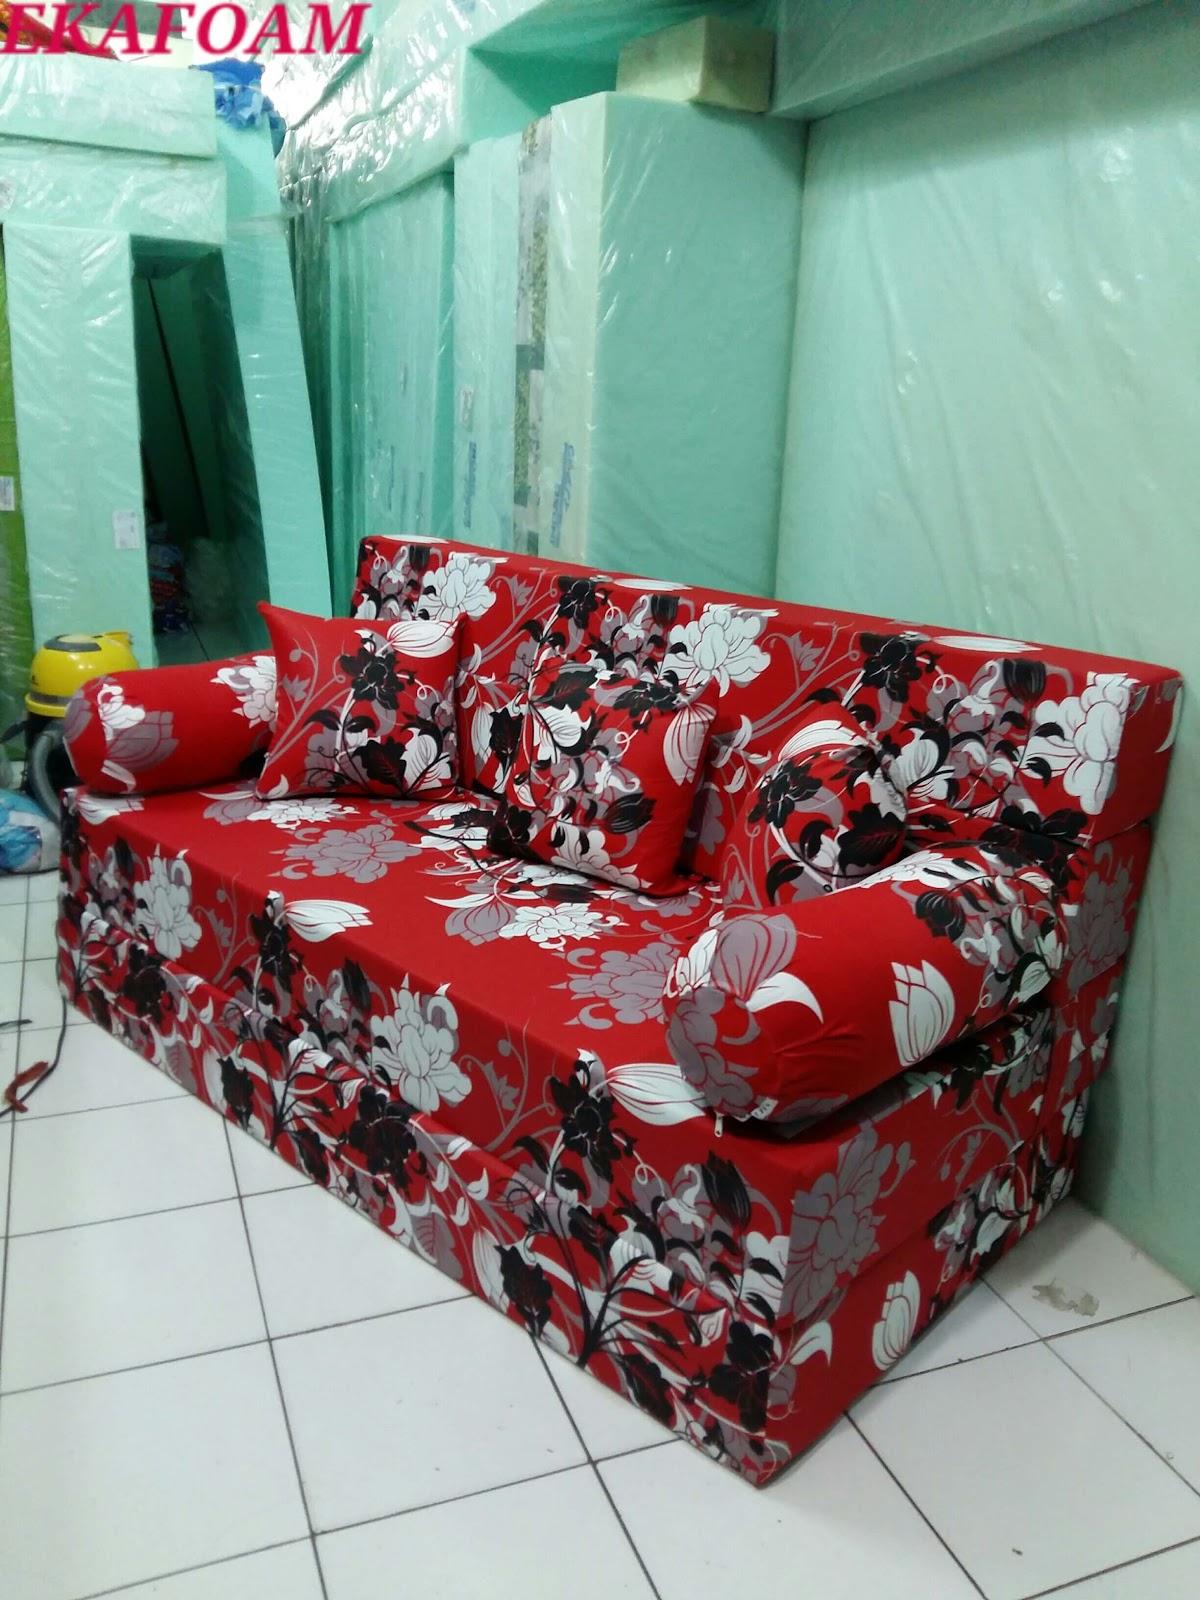 harga sofa bed inoac no 1 brown leather recliner set 2017 full motif agen resmi kasur busa